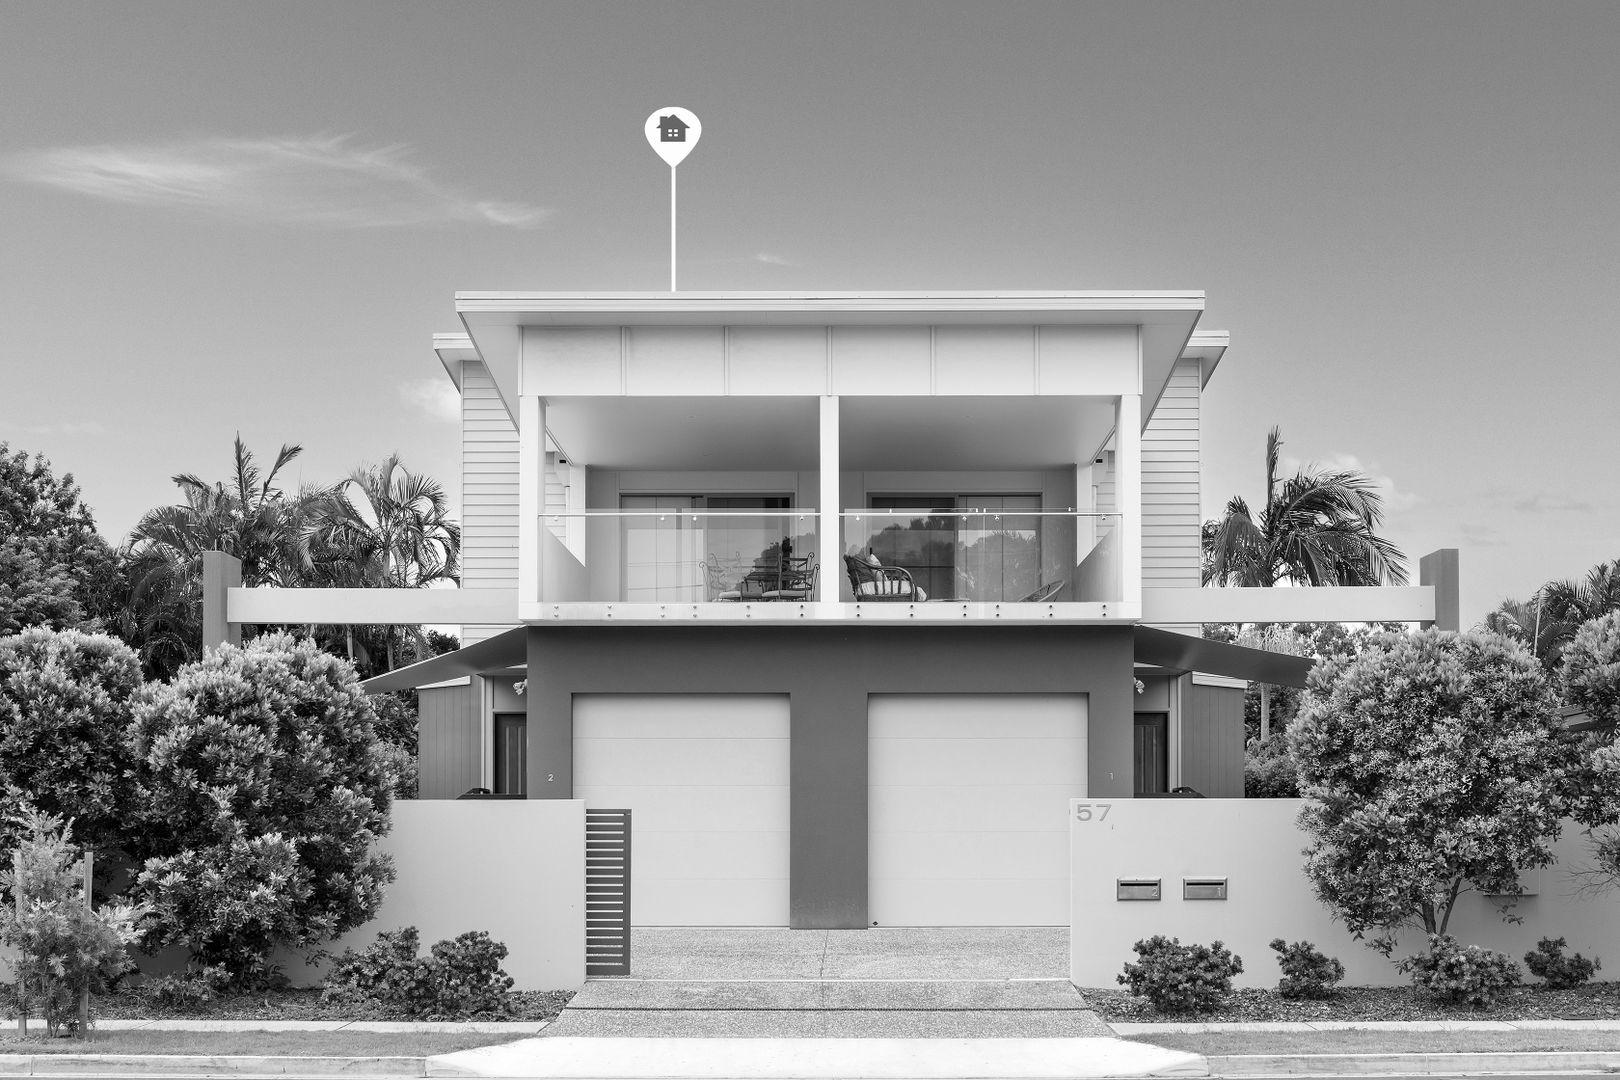 2/57 Hilton Terrace, Tewantin QLD 4565, Image 0